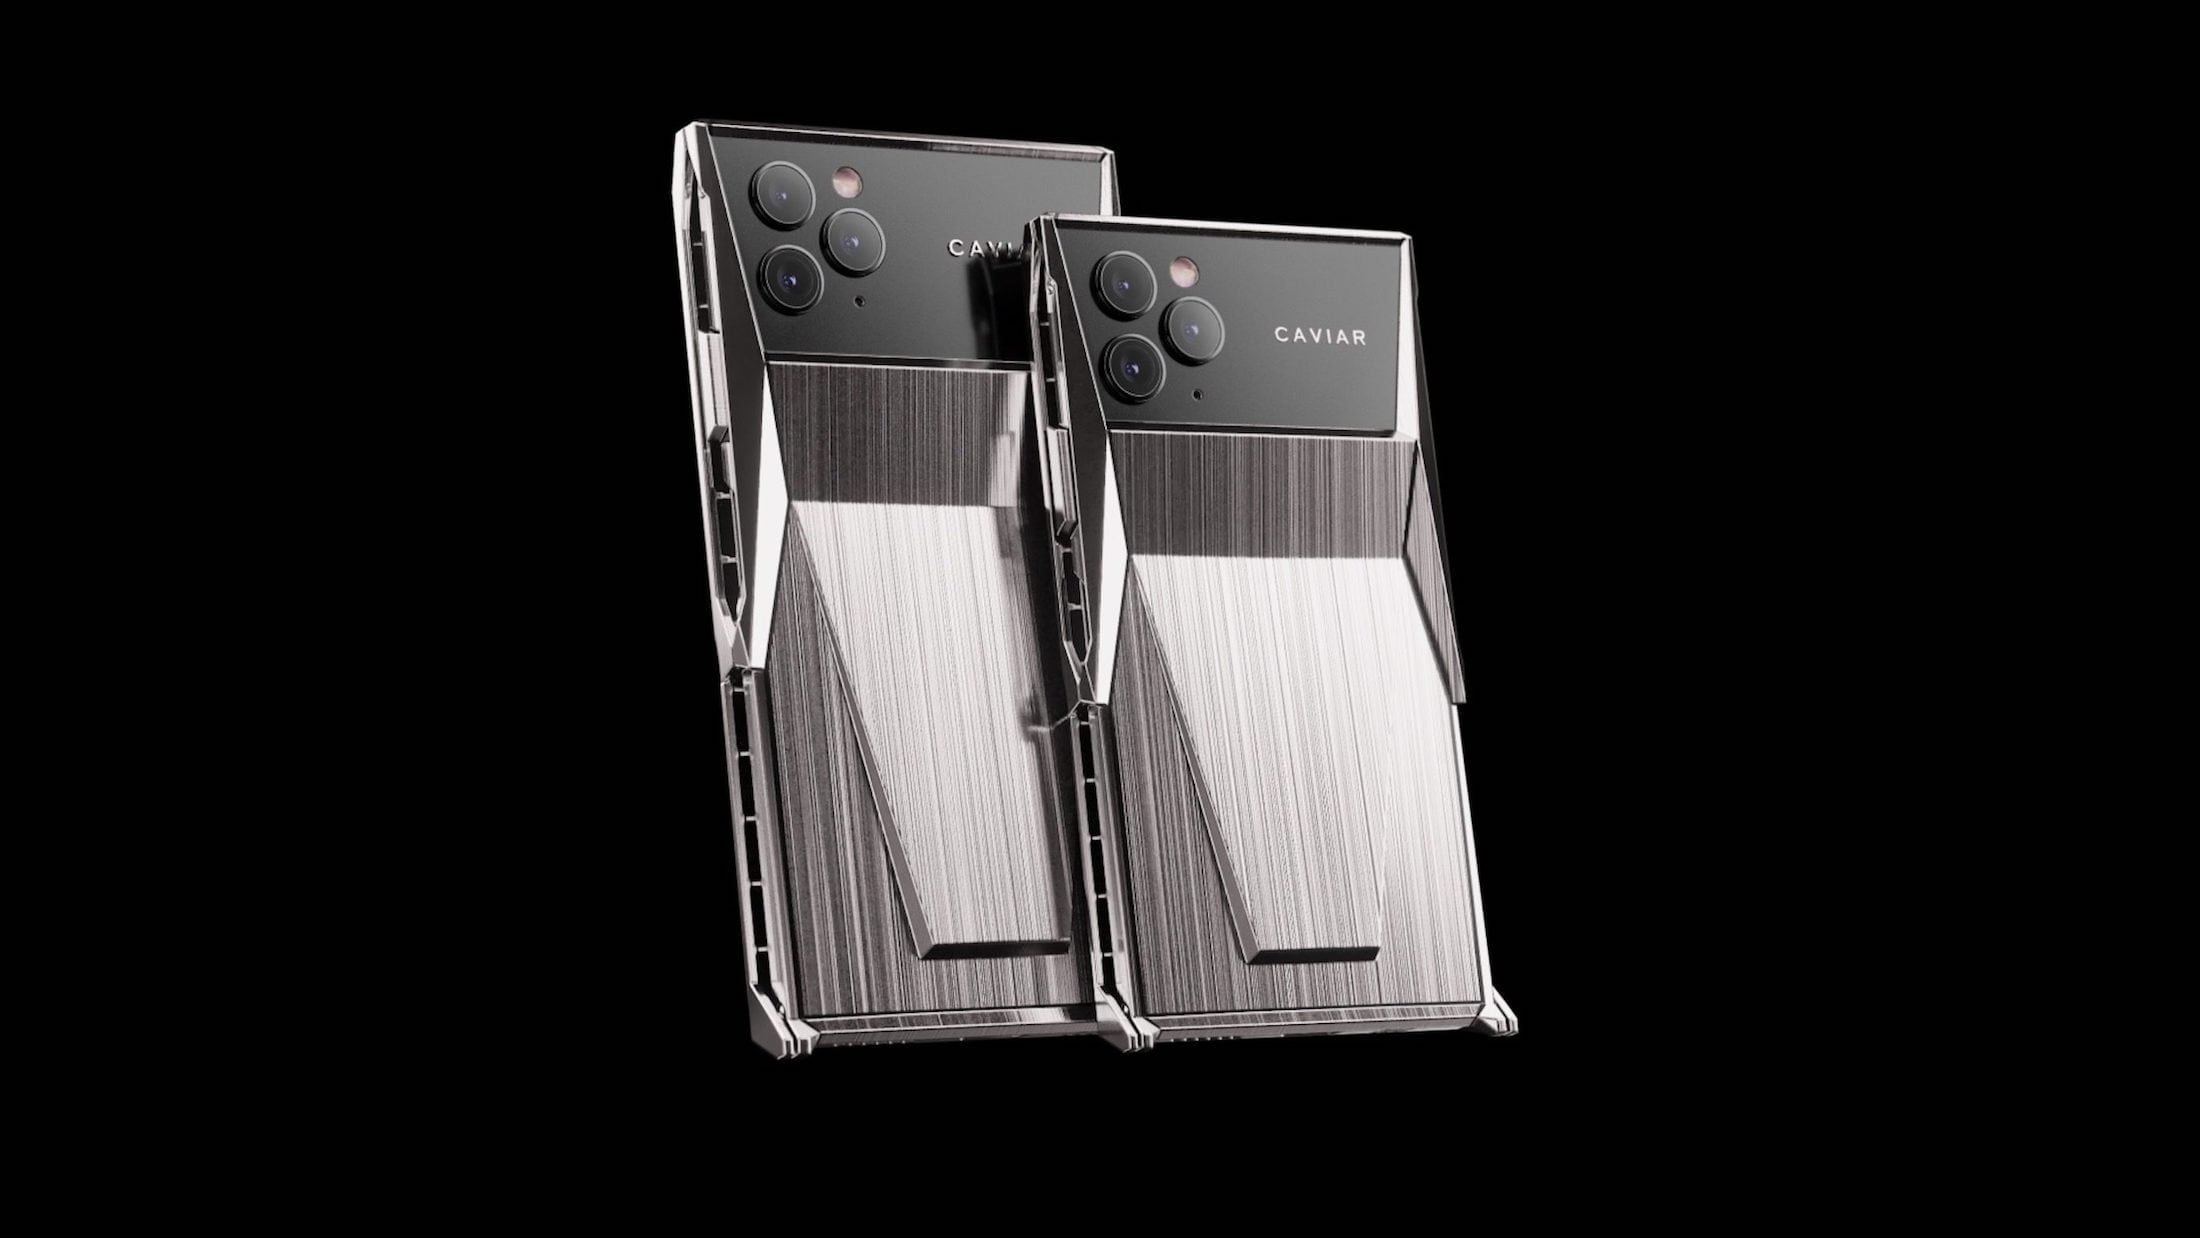 Caviar Cyberphone Tesla Cybertruck iPhone 11 Pro may make you feel like Elon Musk